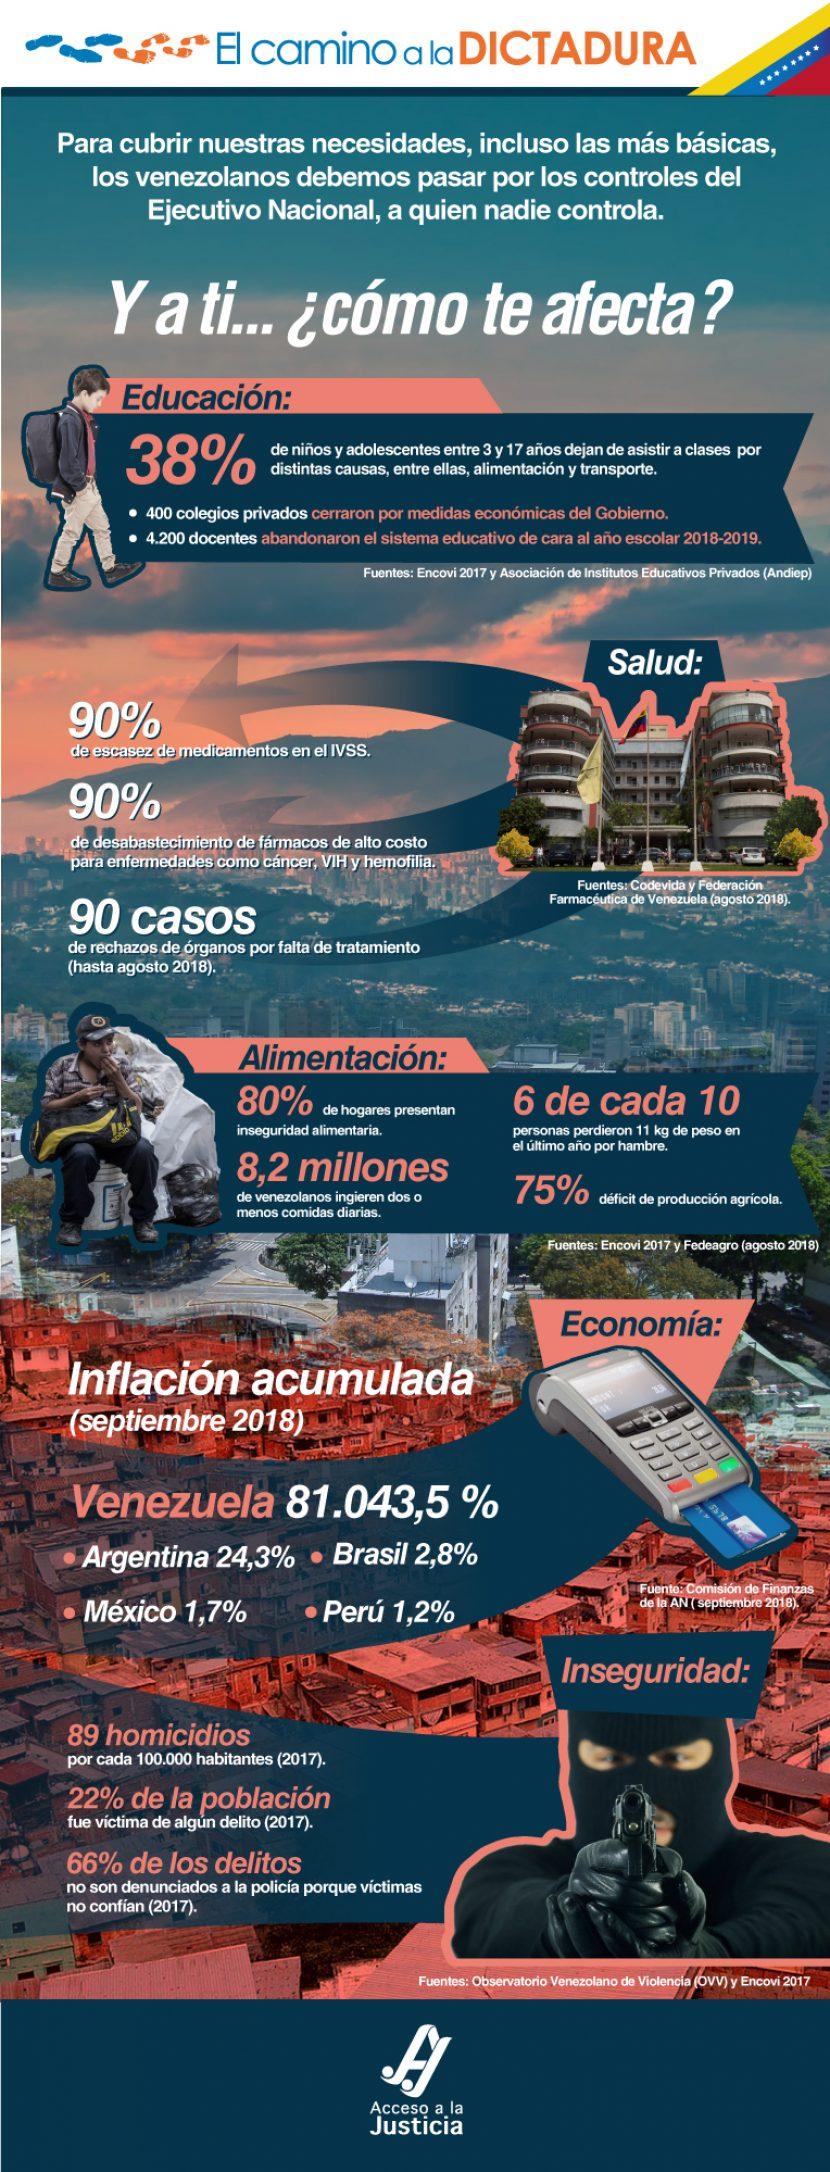 y-a-ti-venezolano-camino-a-la-dictadura